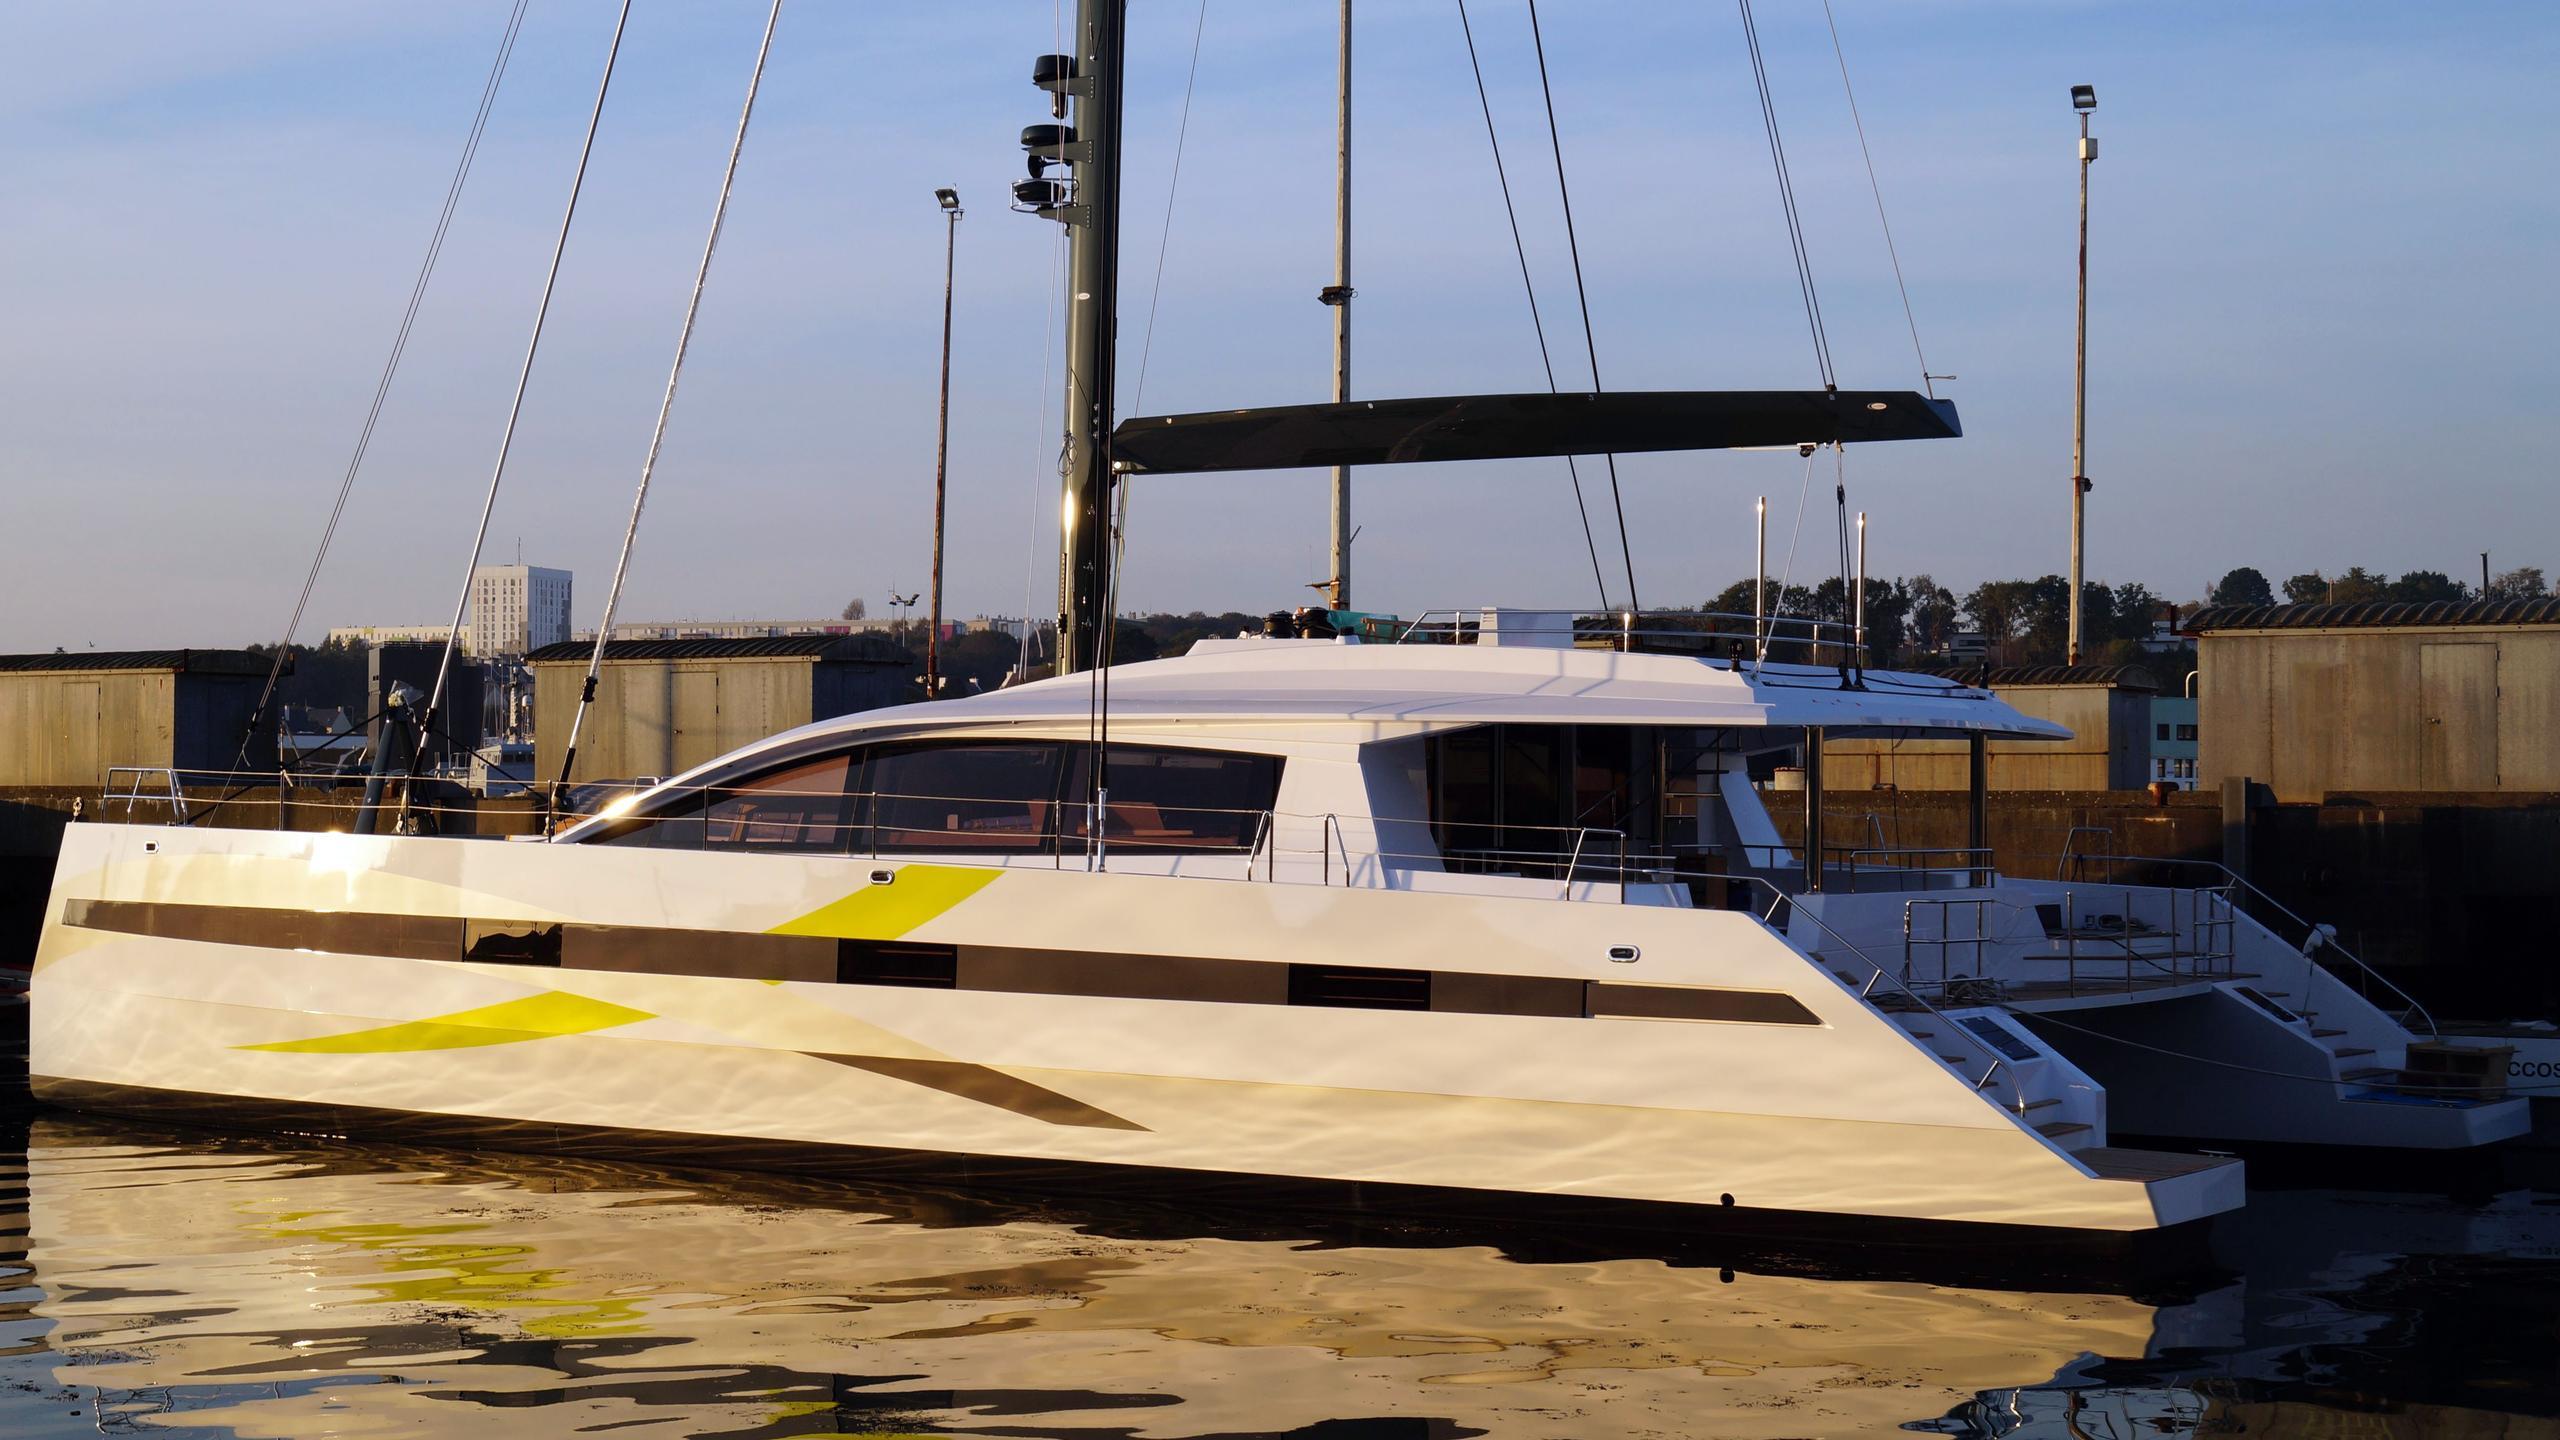 long island 85 hull 2 catamaran sailing yacht jfa yachts 26m 2017 half stern